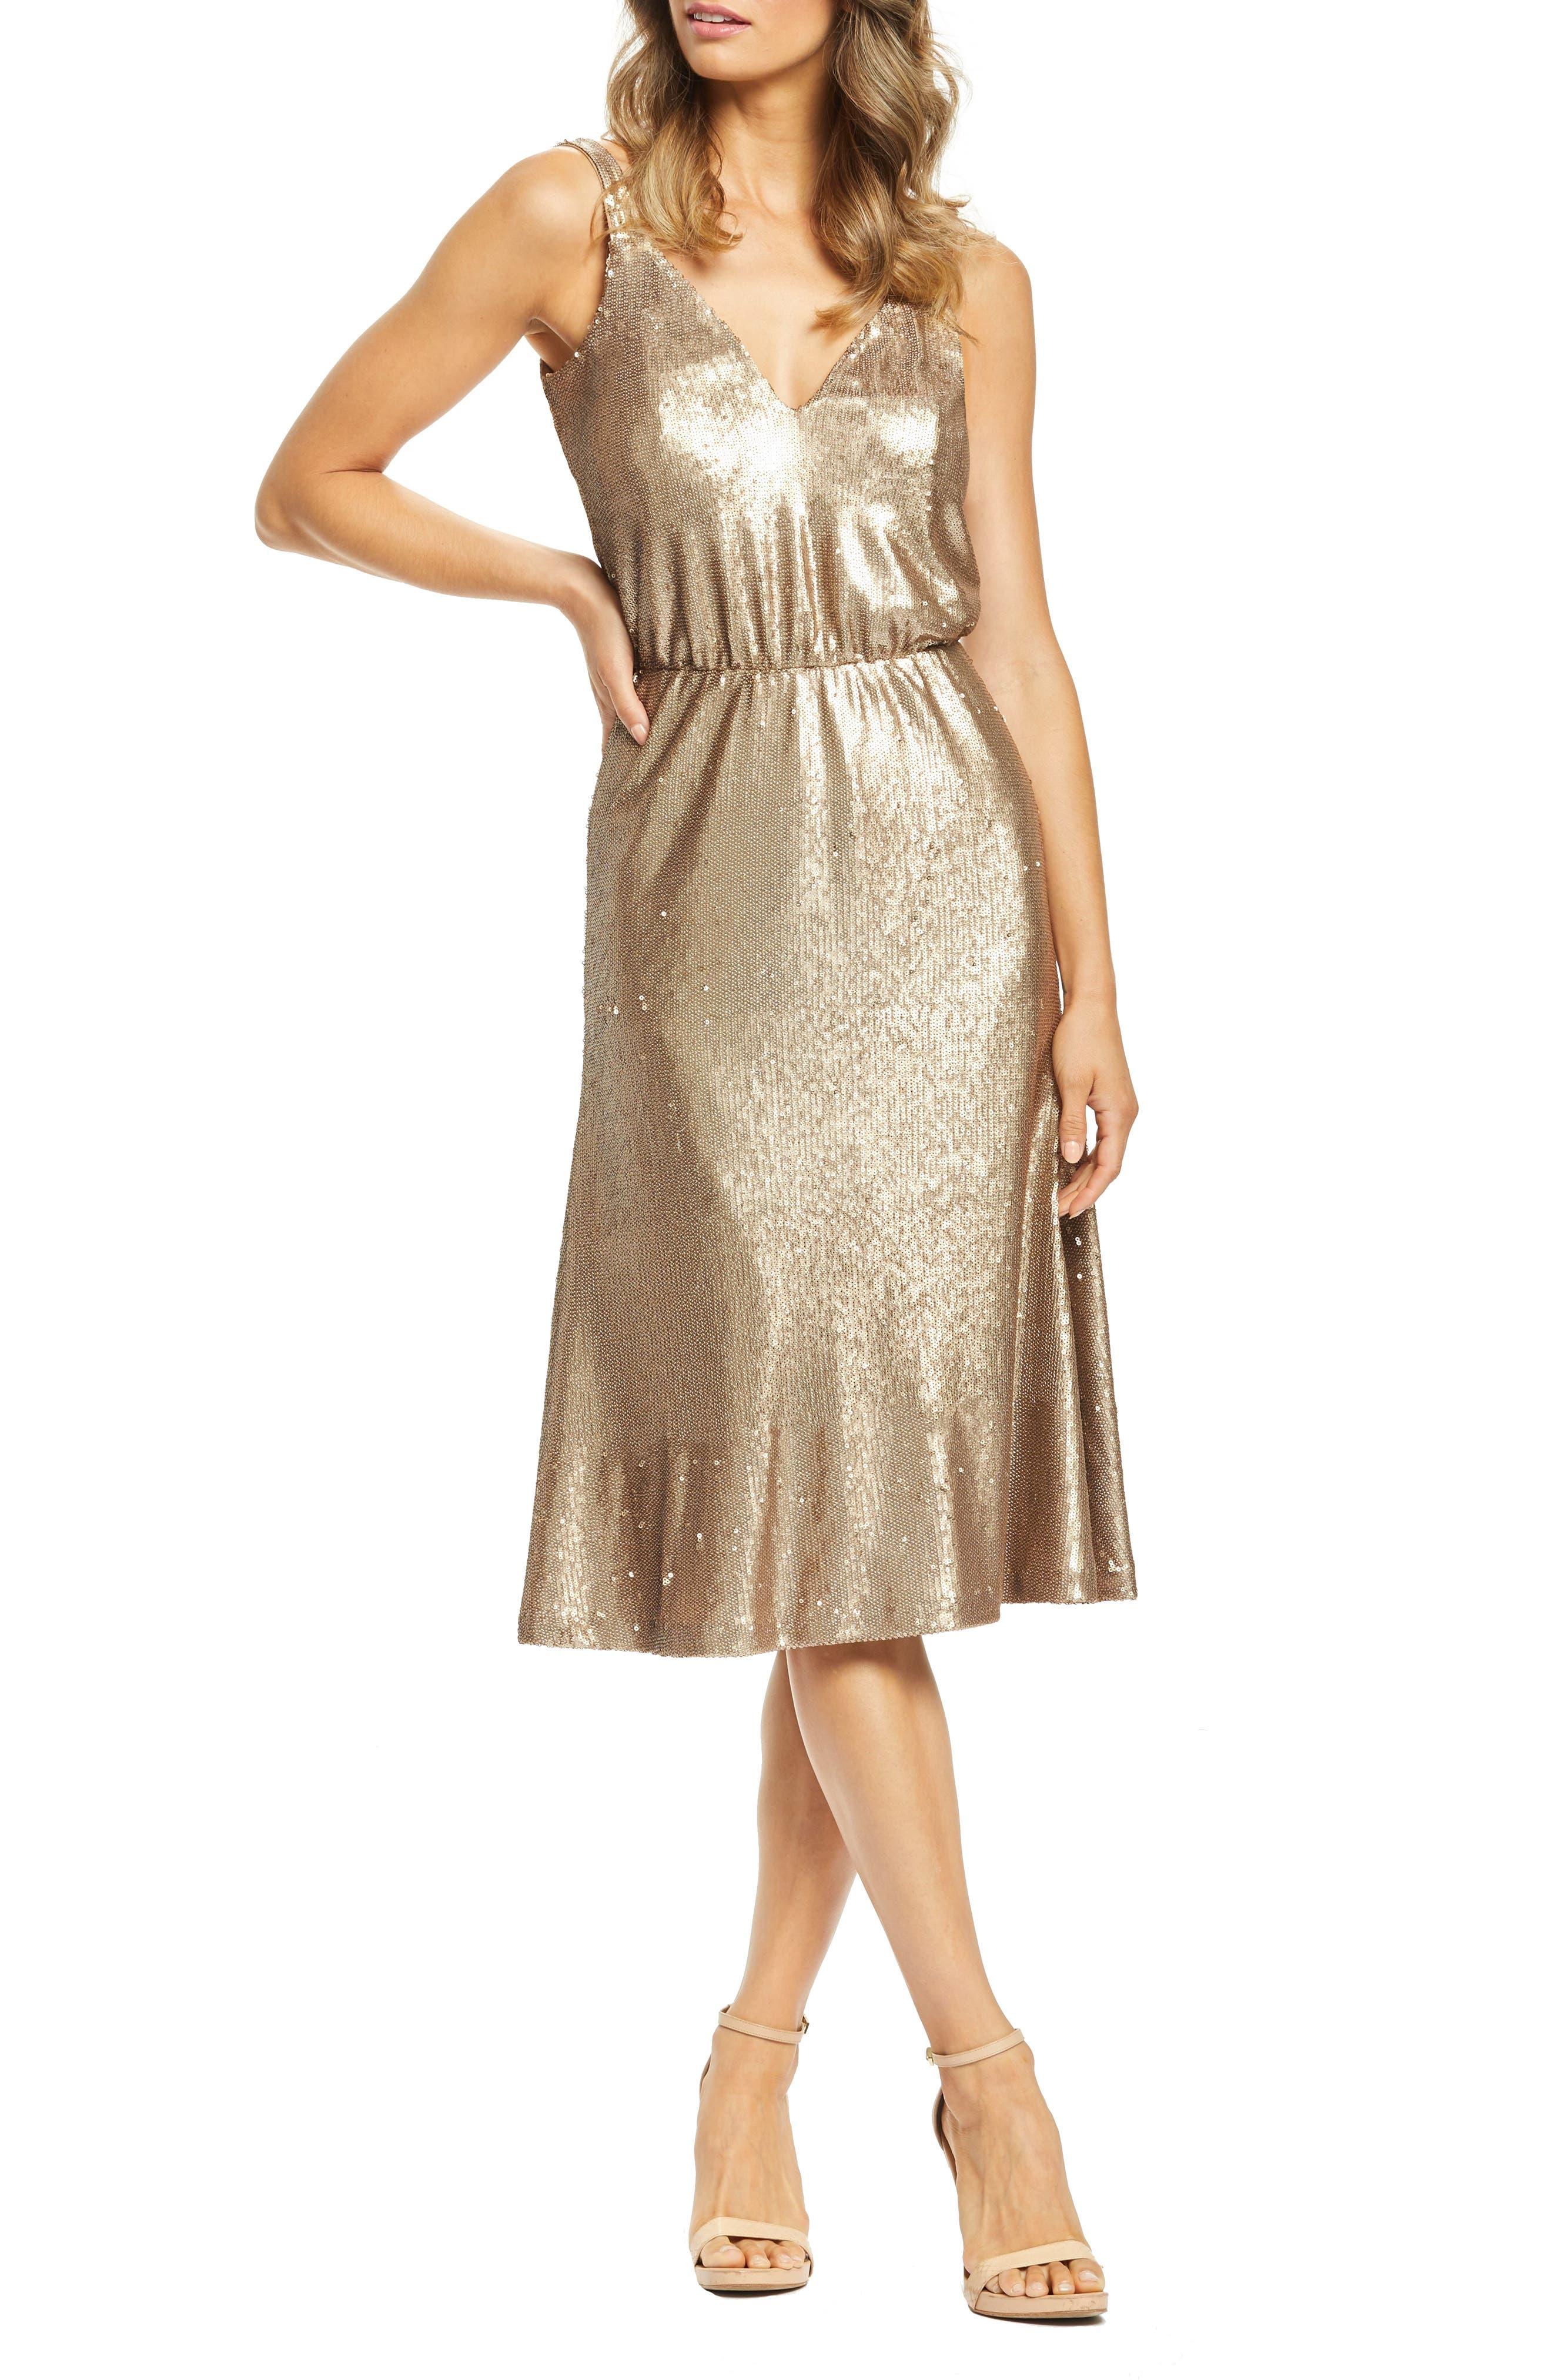 1960s – 70s Cocktail, Party, Prom, Evening Dresses Womens Dress The Population Cameron Sequin Blouson Dress Size XX-Large - Metallic $148.80 AT vintagedancer.com